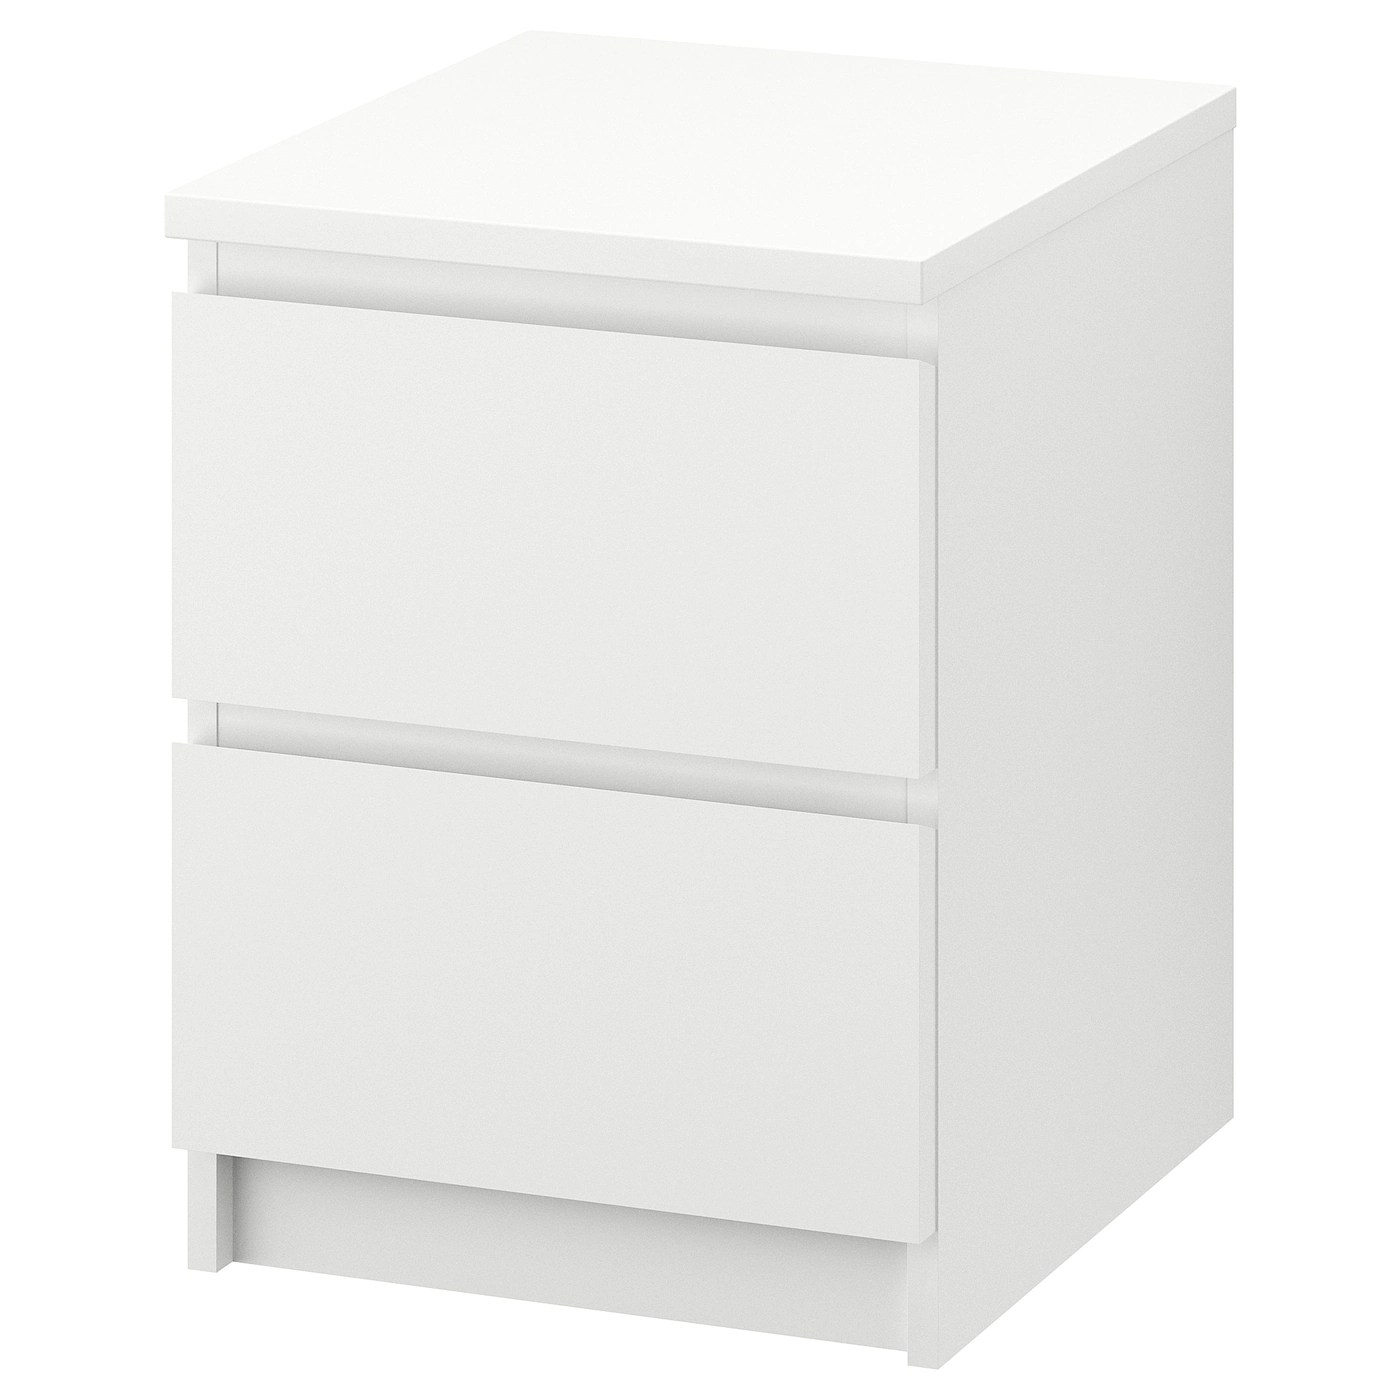 Malm 2 Drawer Chest White 15 3 4x21 5 8 Ikea